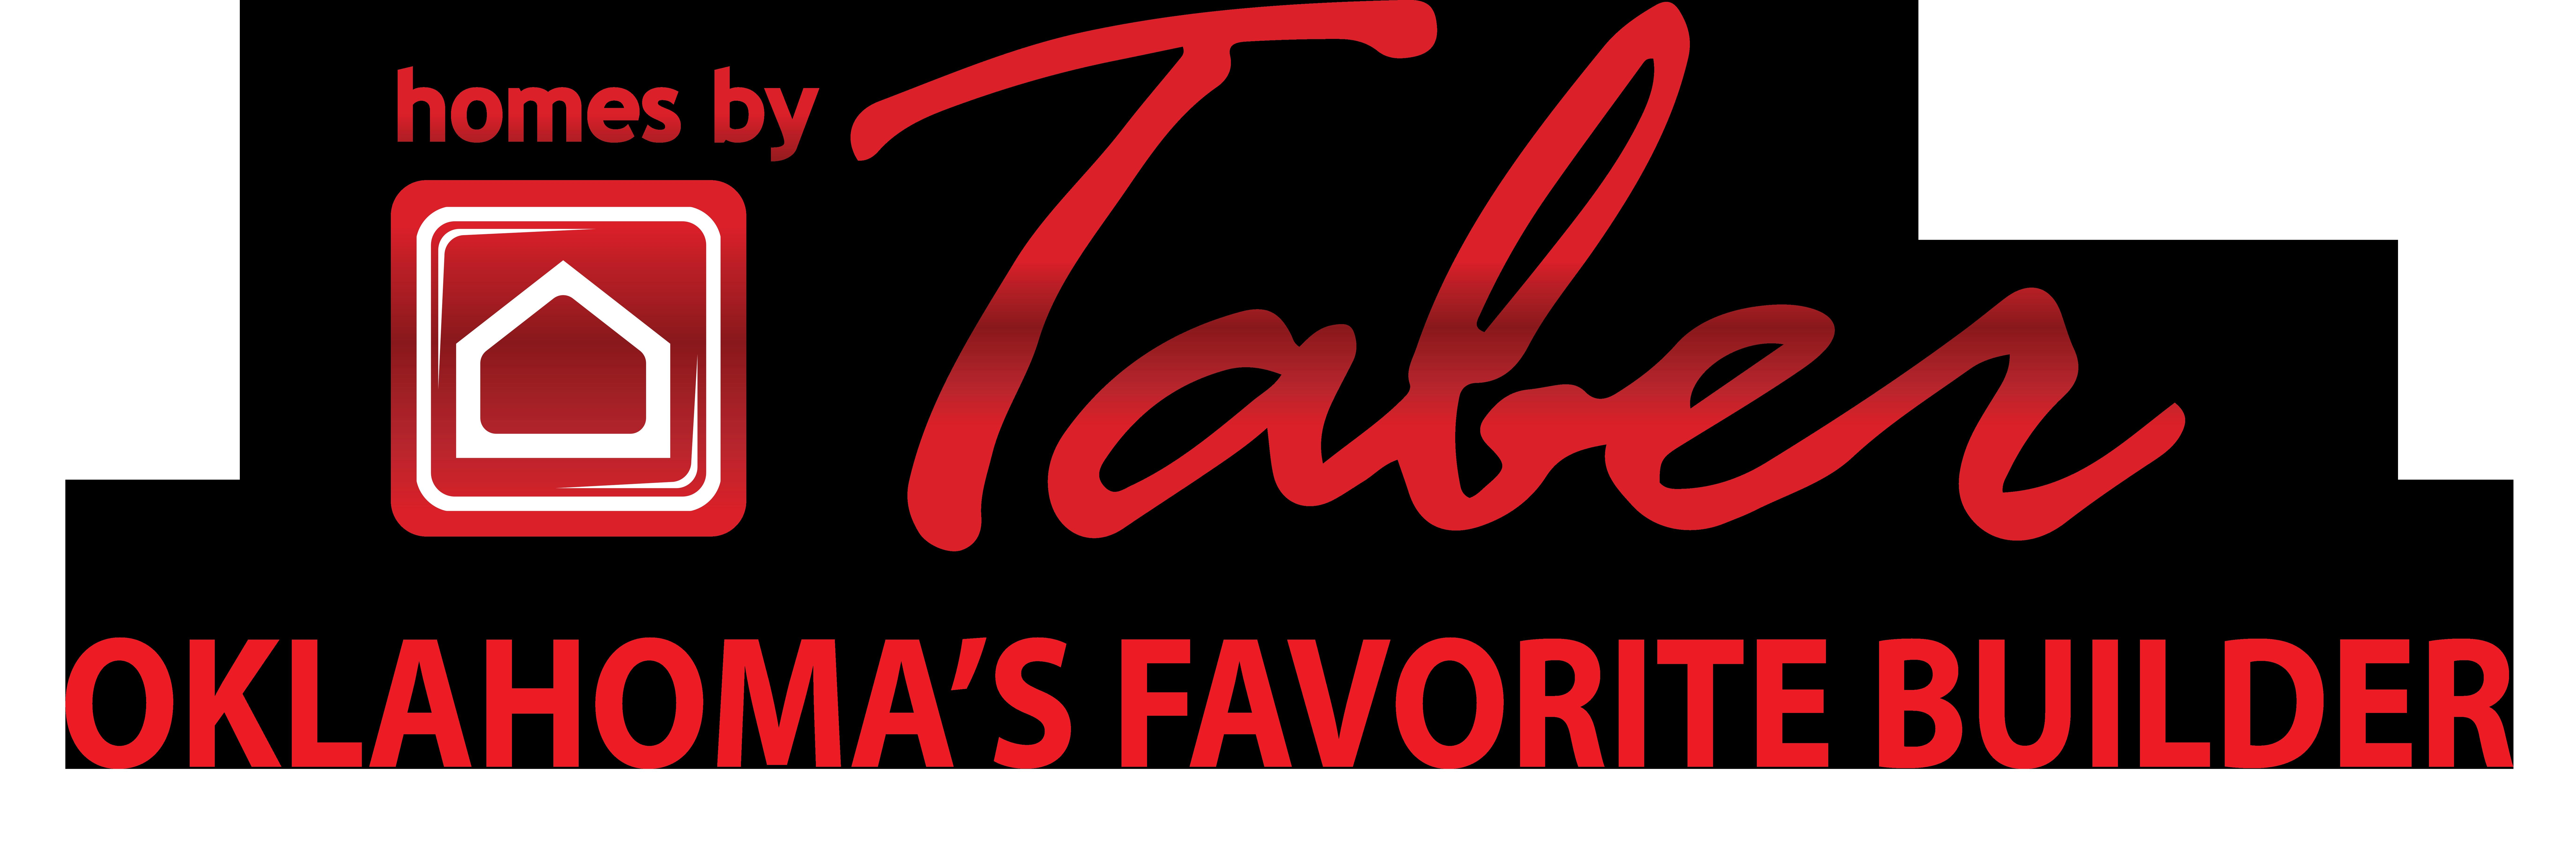 Homes by Taber Company Logo